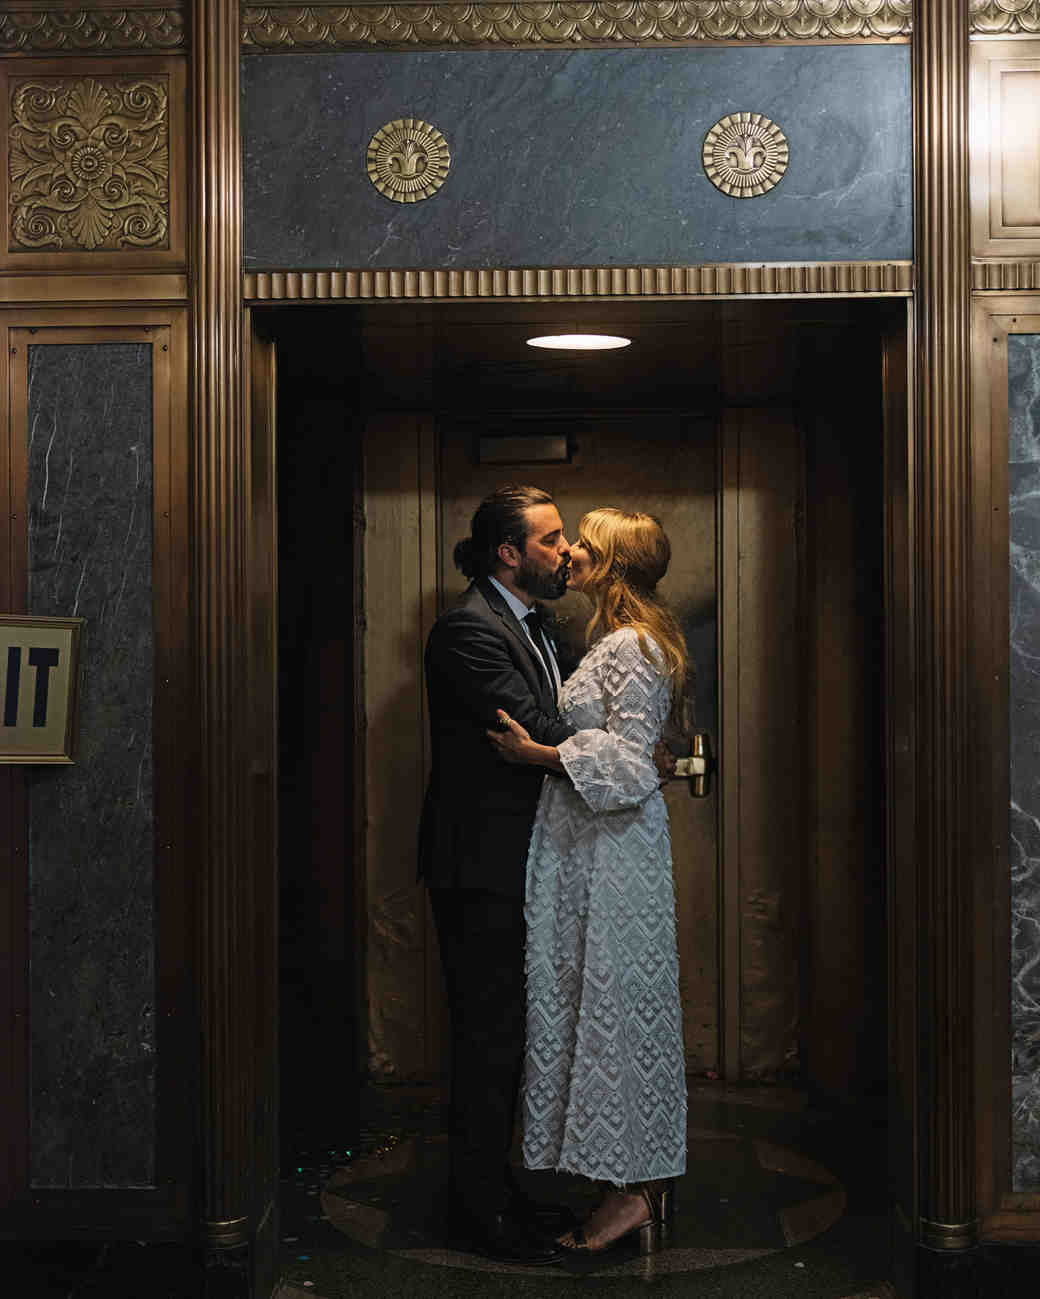 morgan jon paul wedding couple kissing in doorway